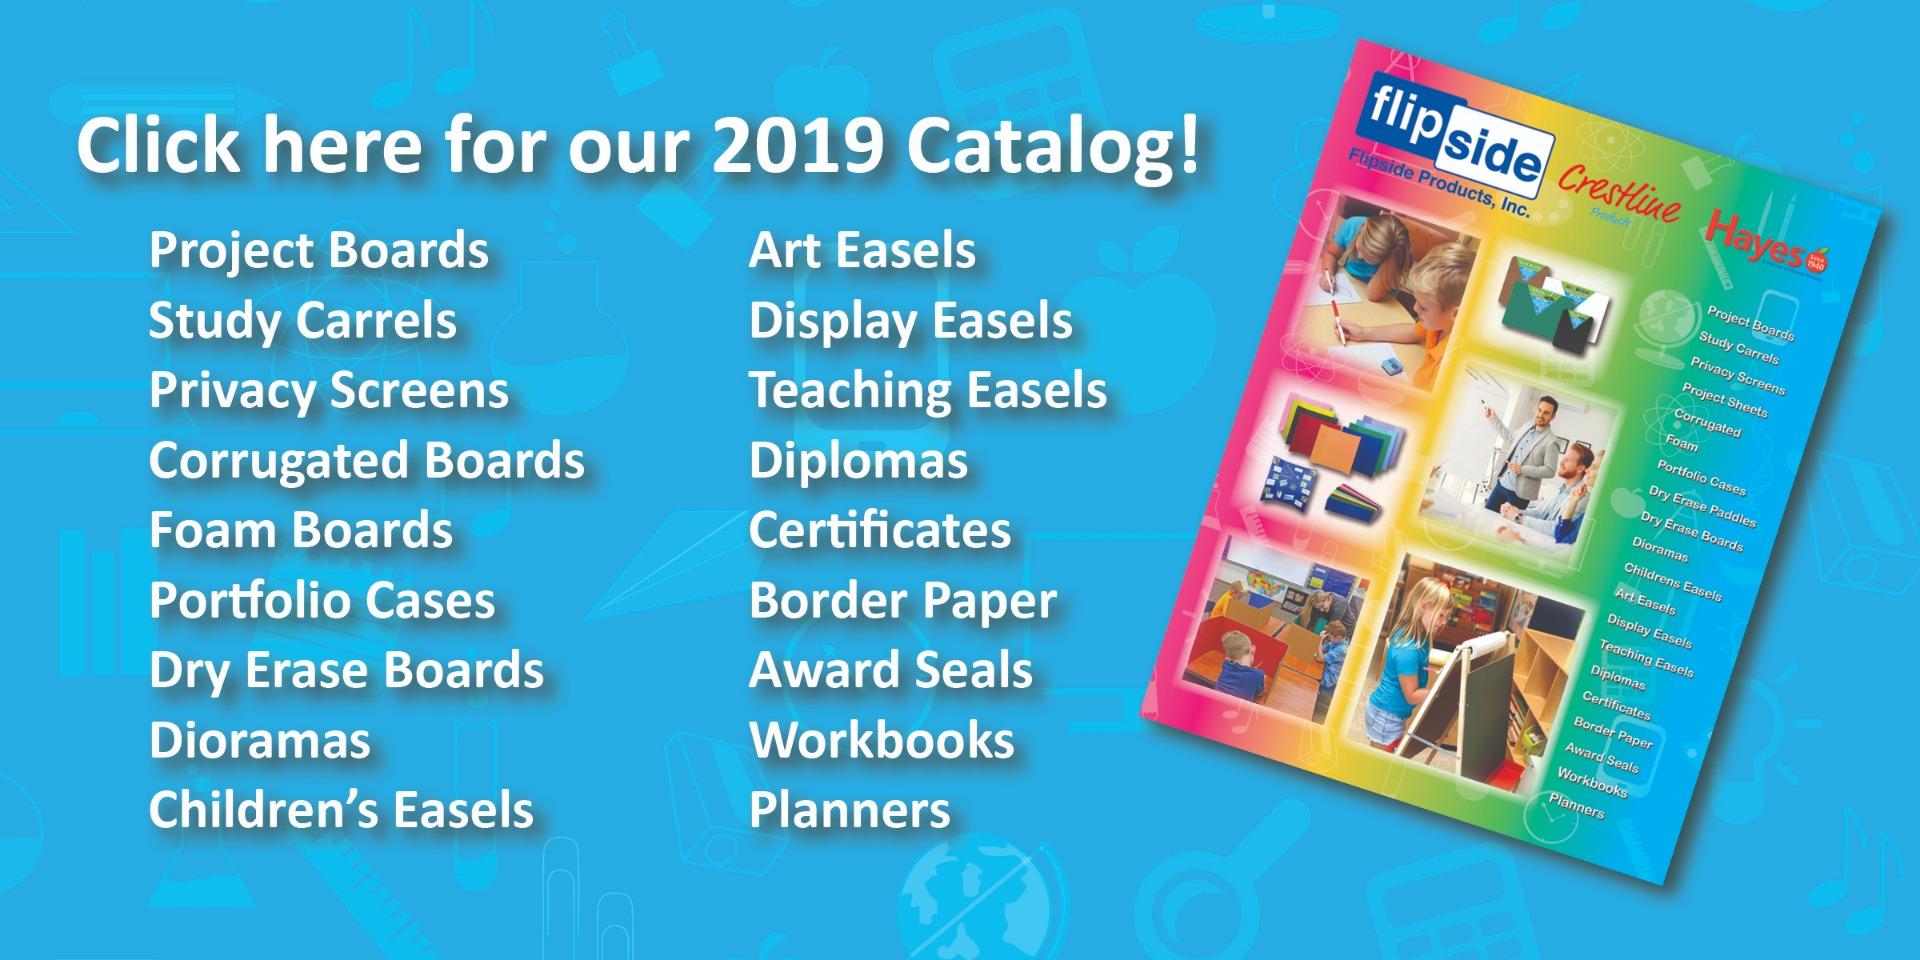 2019 Flipside Catalog